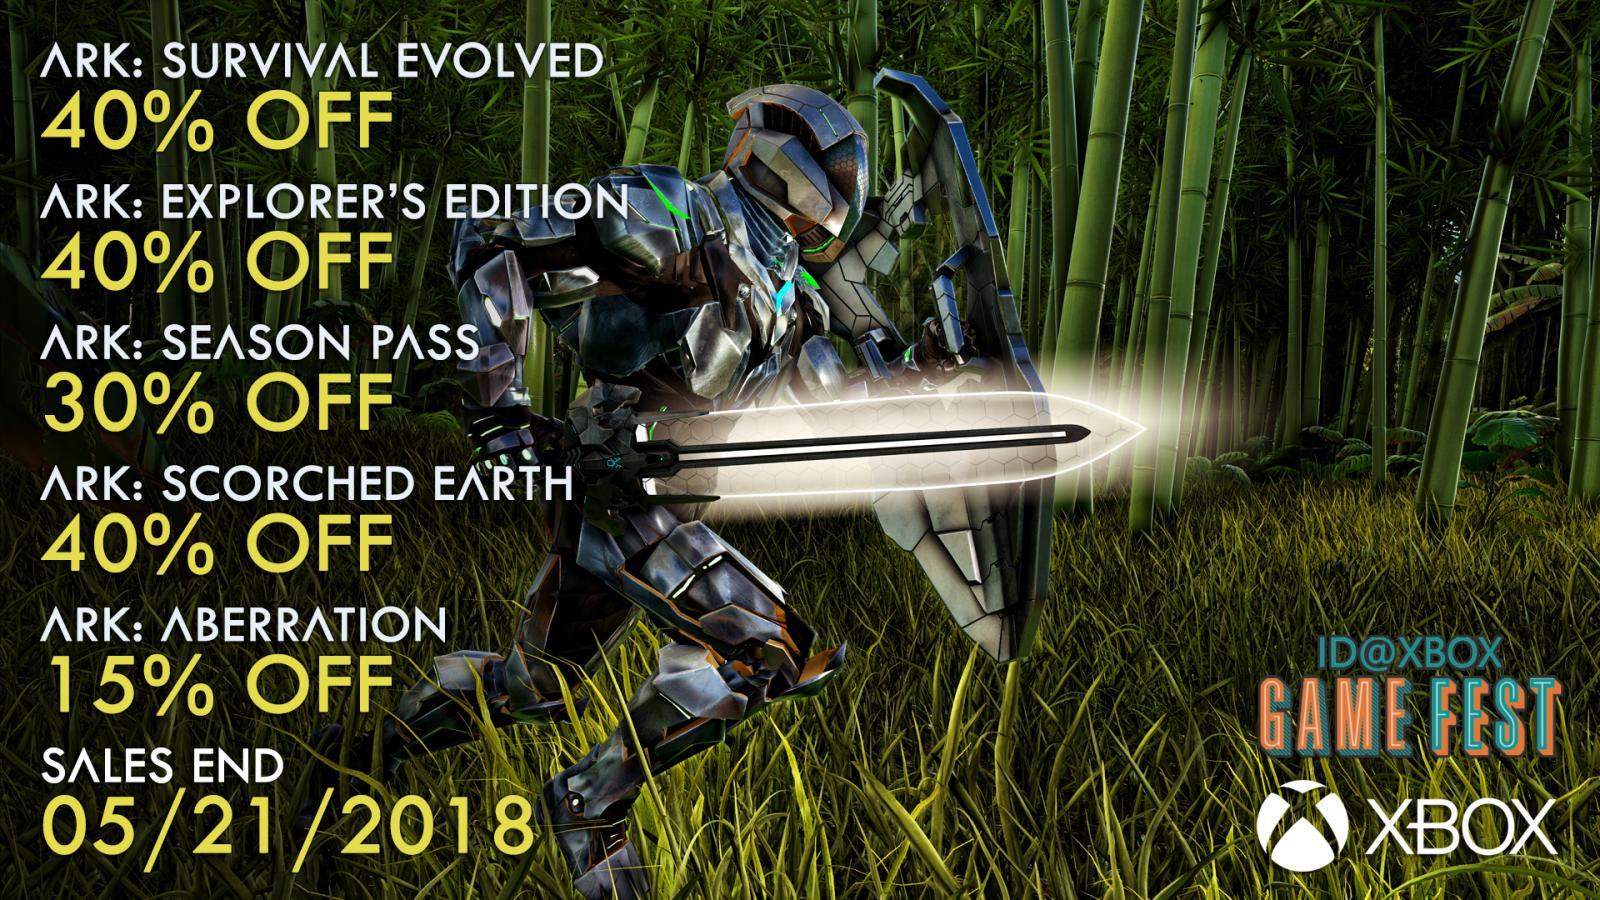 ID @ XBOX Game Fest Sale